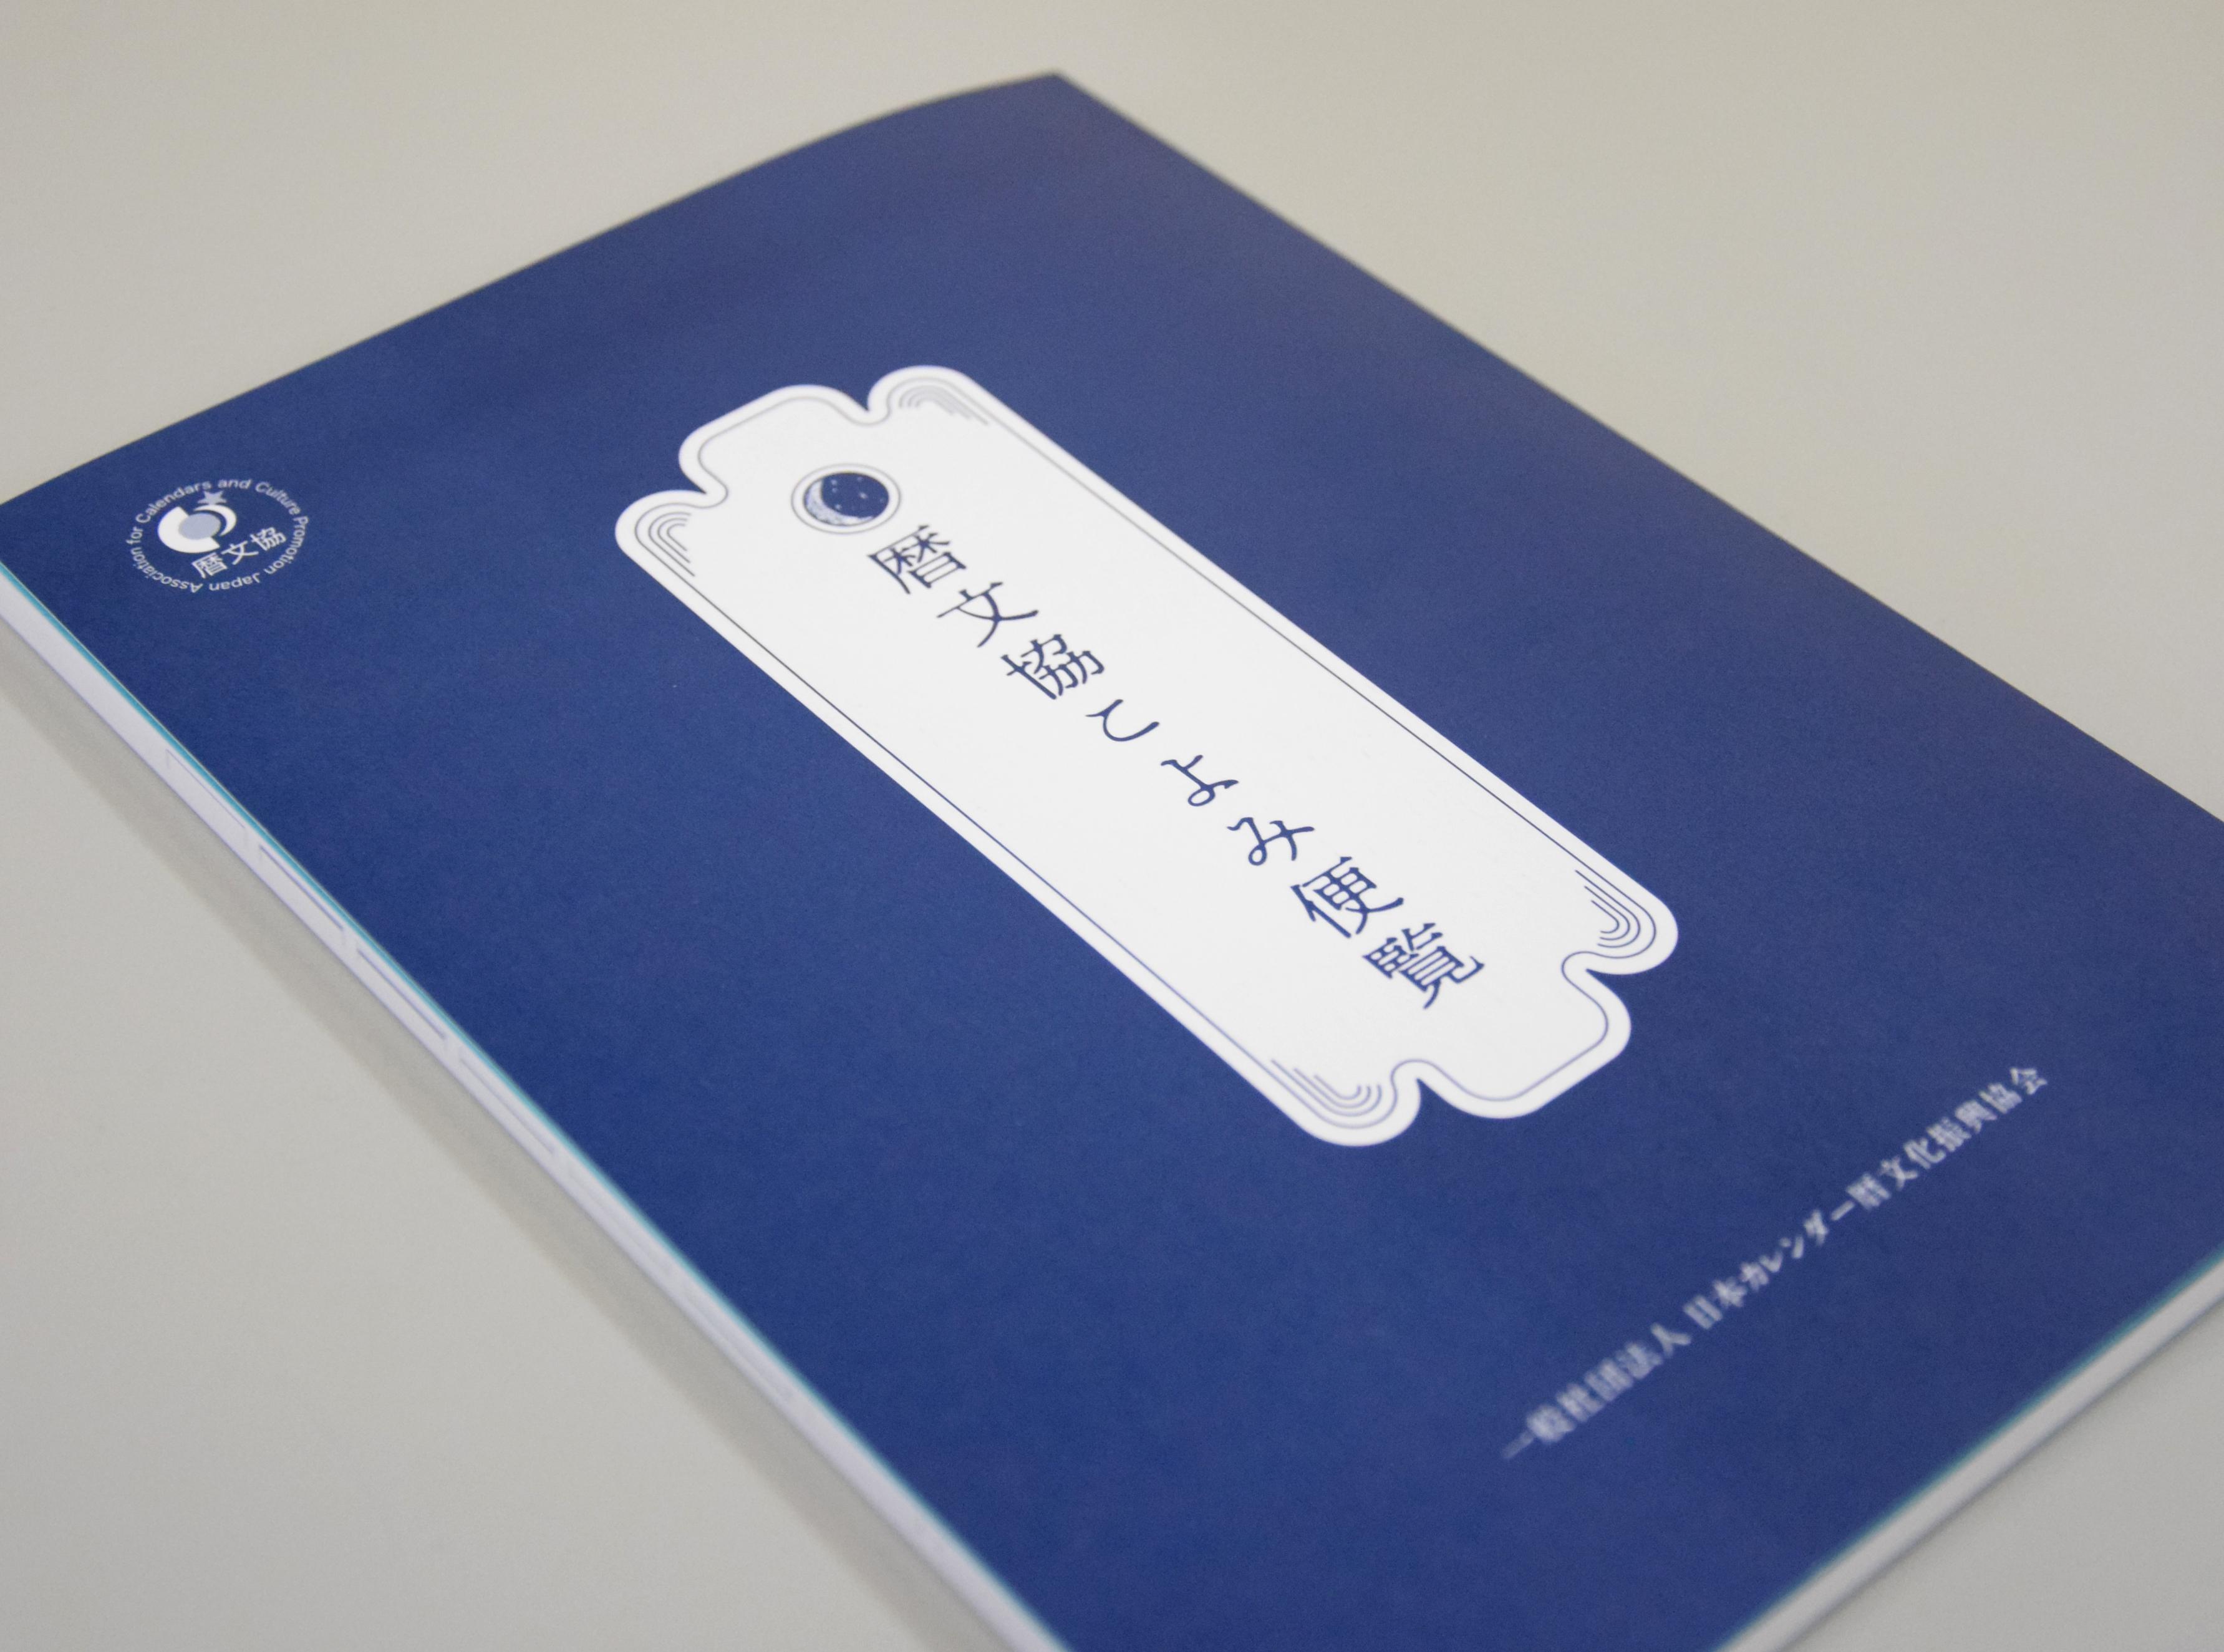 <span>Book</span><br> 一般社団法人日本カレンダー暦文化振興協会<br>暦文協こよみ便覧